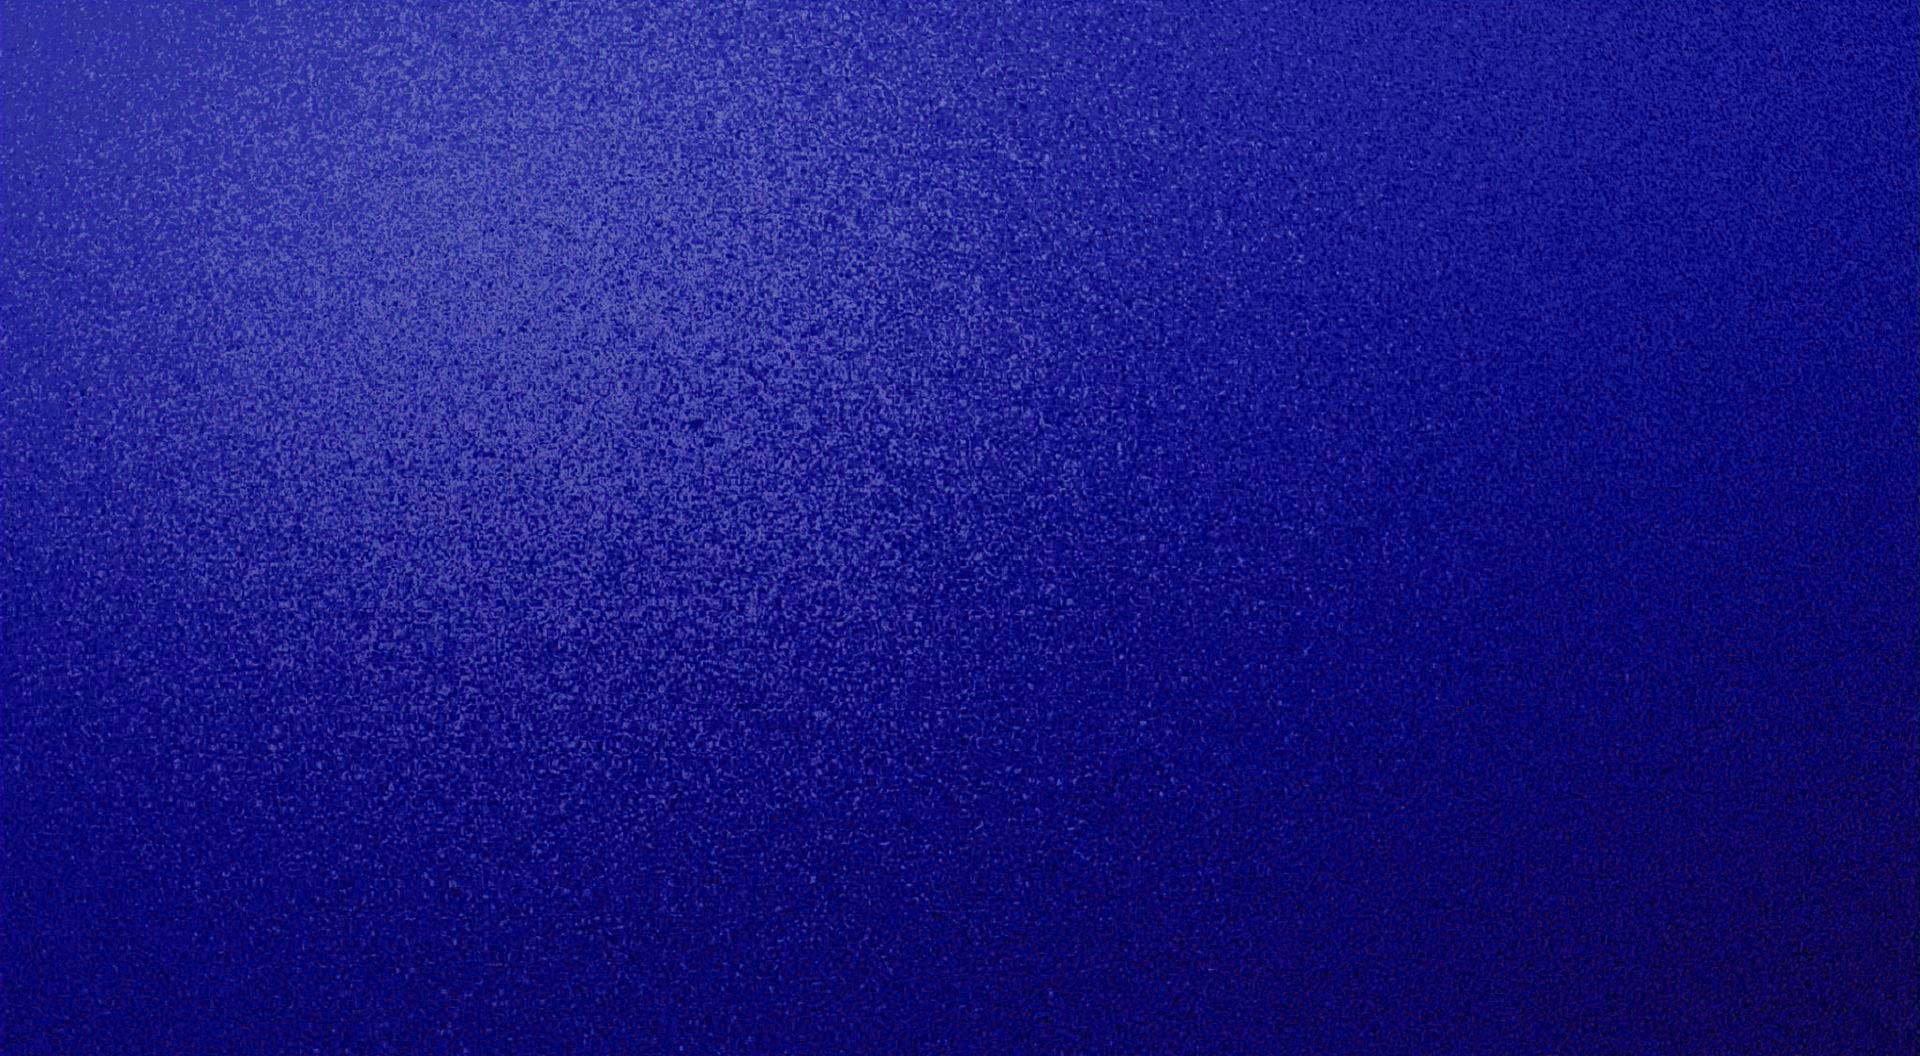 Dark Blue Backgrounds 1920x1056